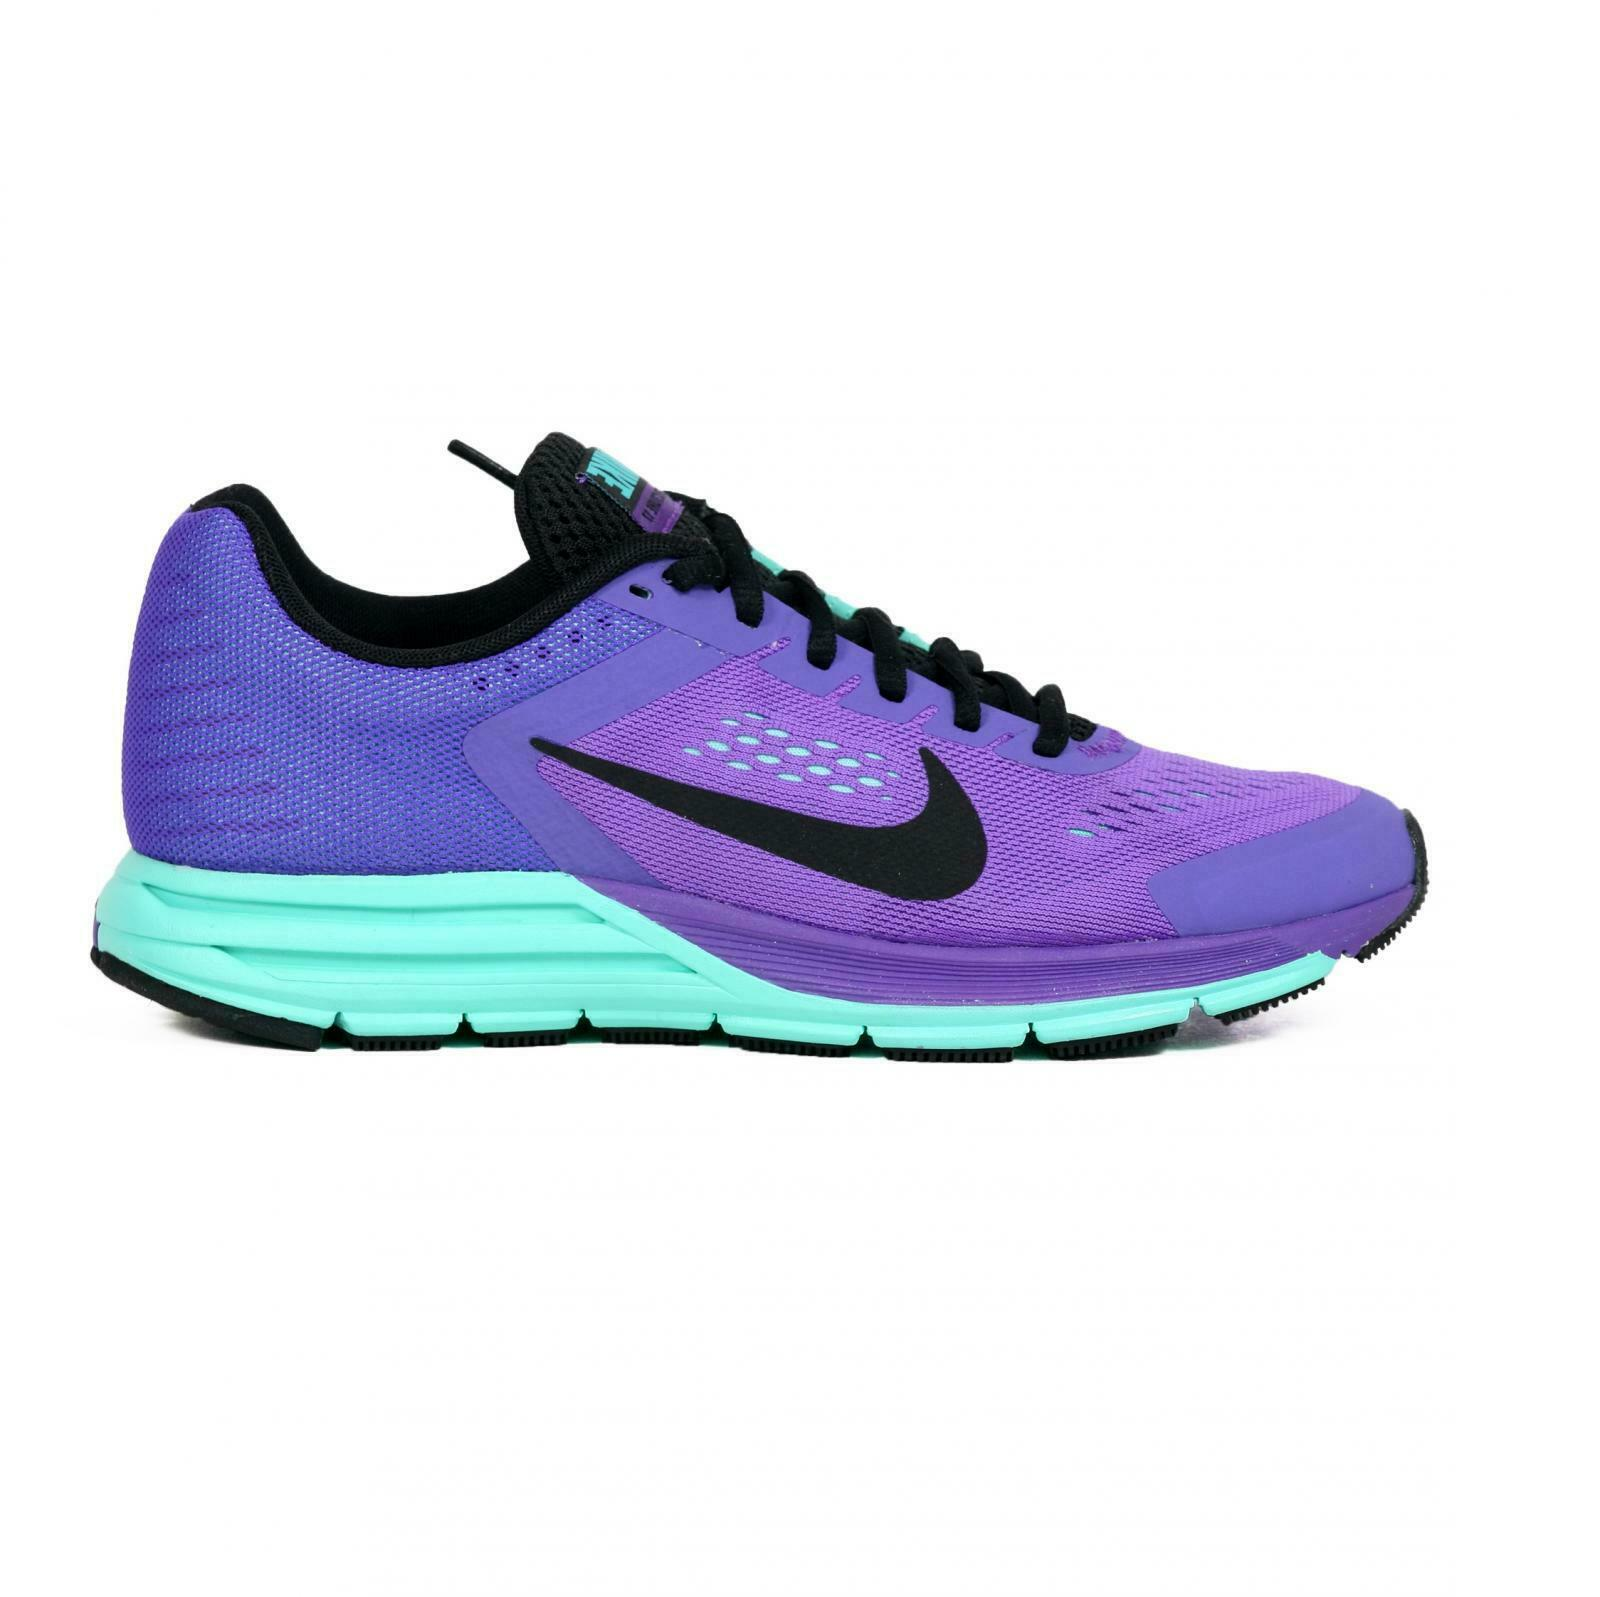 Donna Nike Zoom Struttura Iper Iper Iper Uva Scarpe da Corsa 615588 500 c75ead